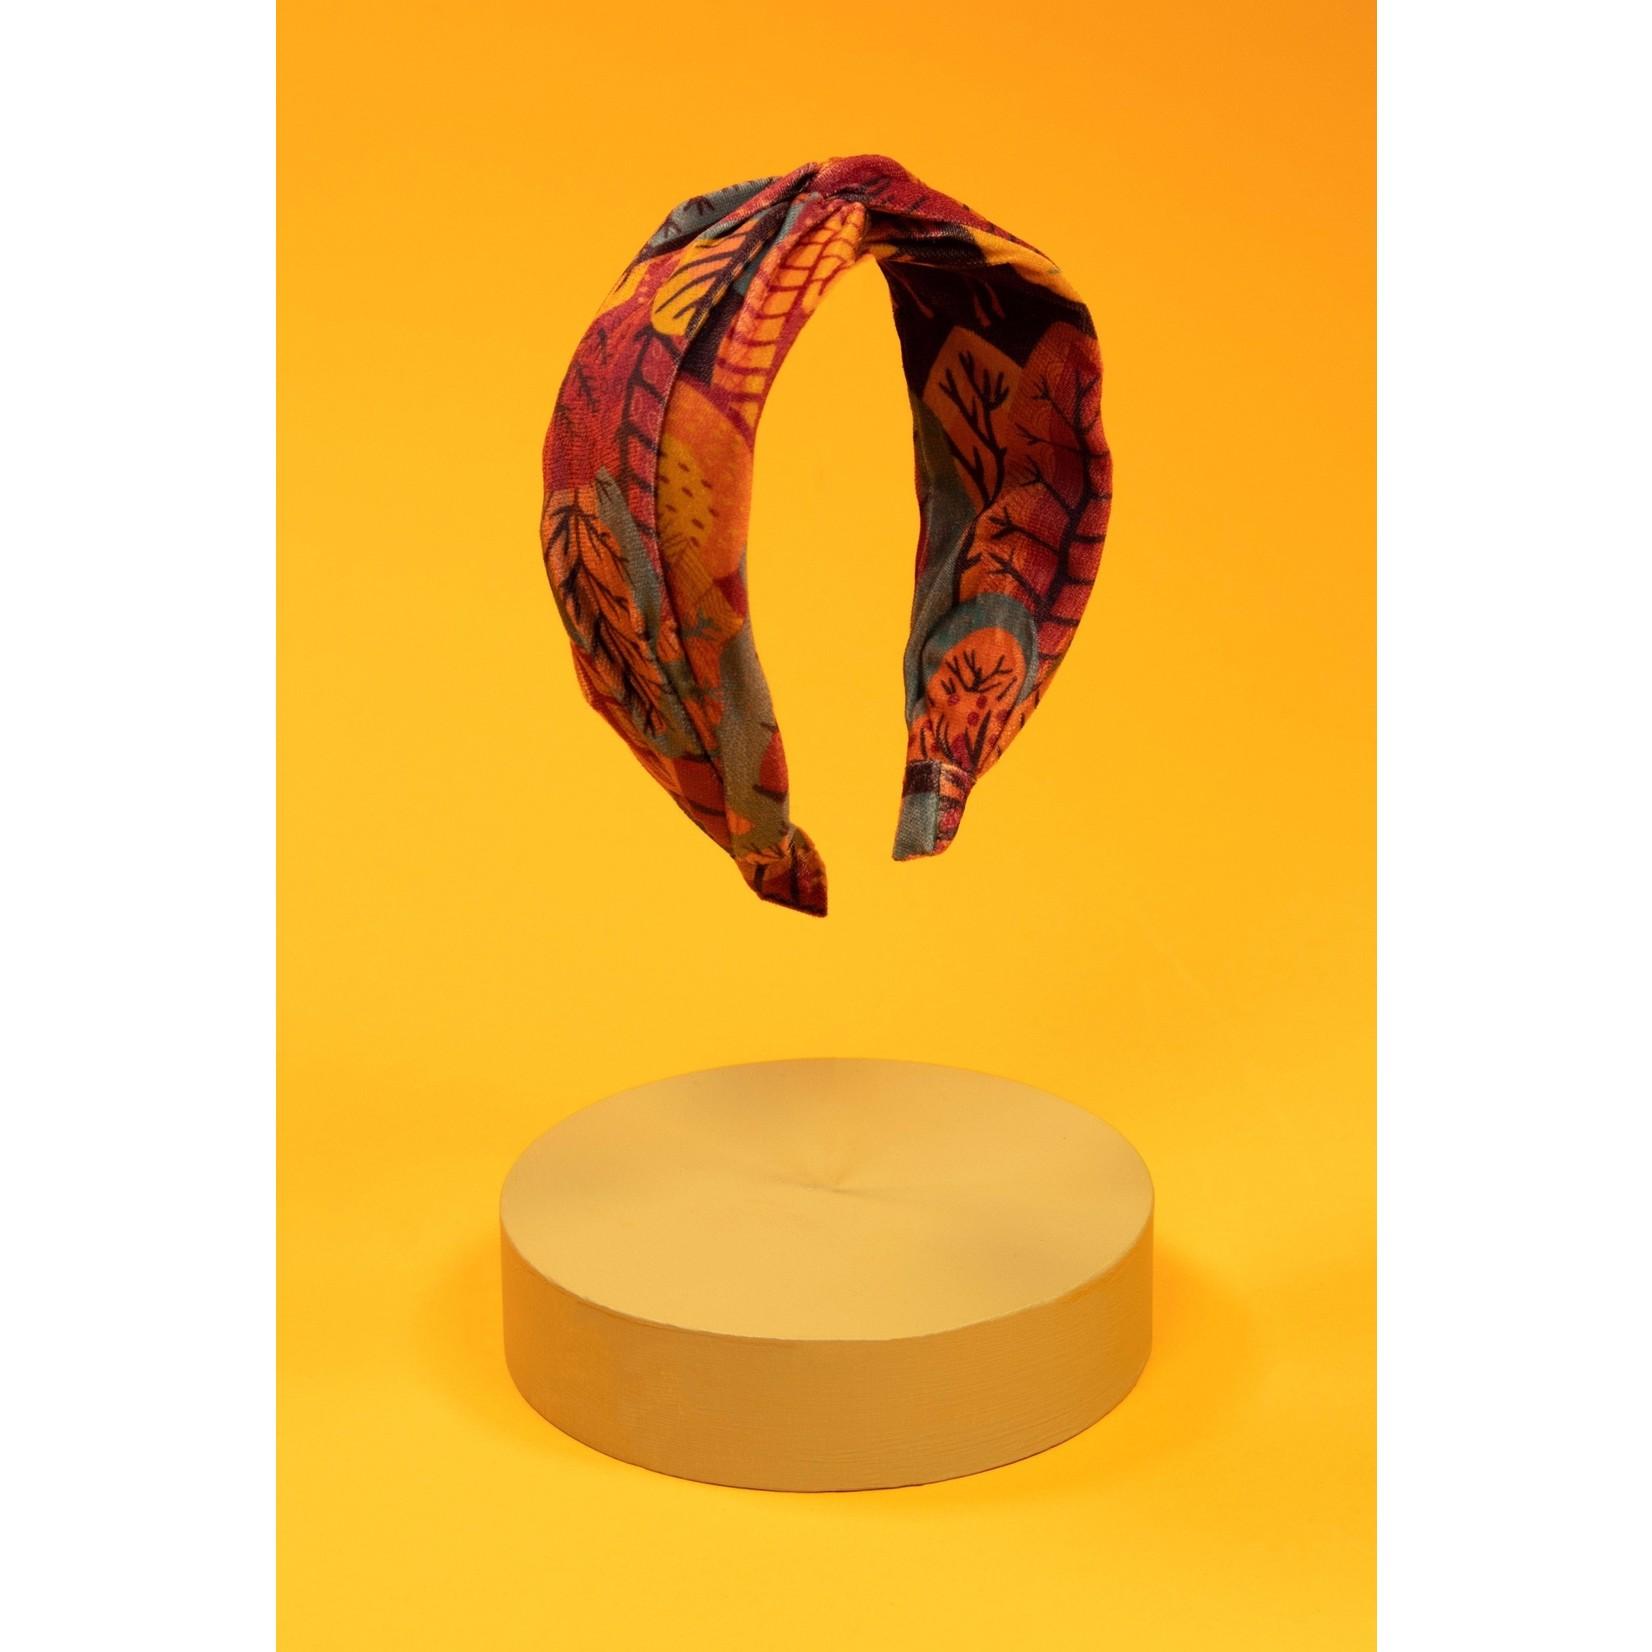 Powder Scandi Forest Printed Velvet Headband in Teal Mix